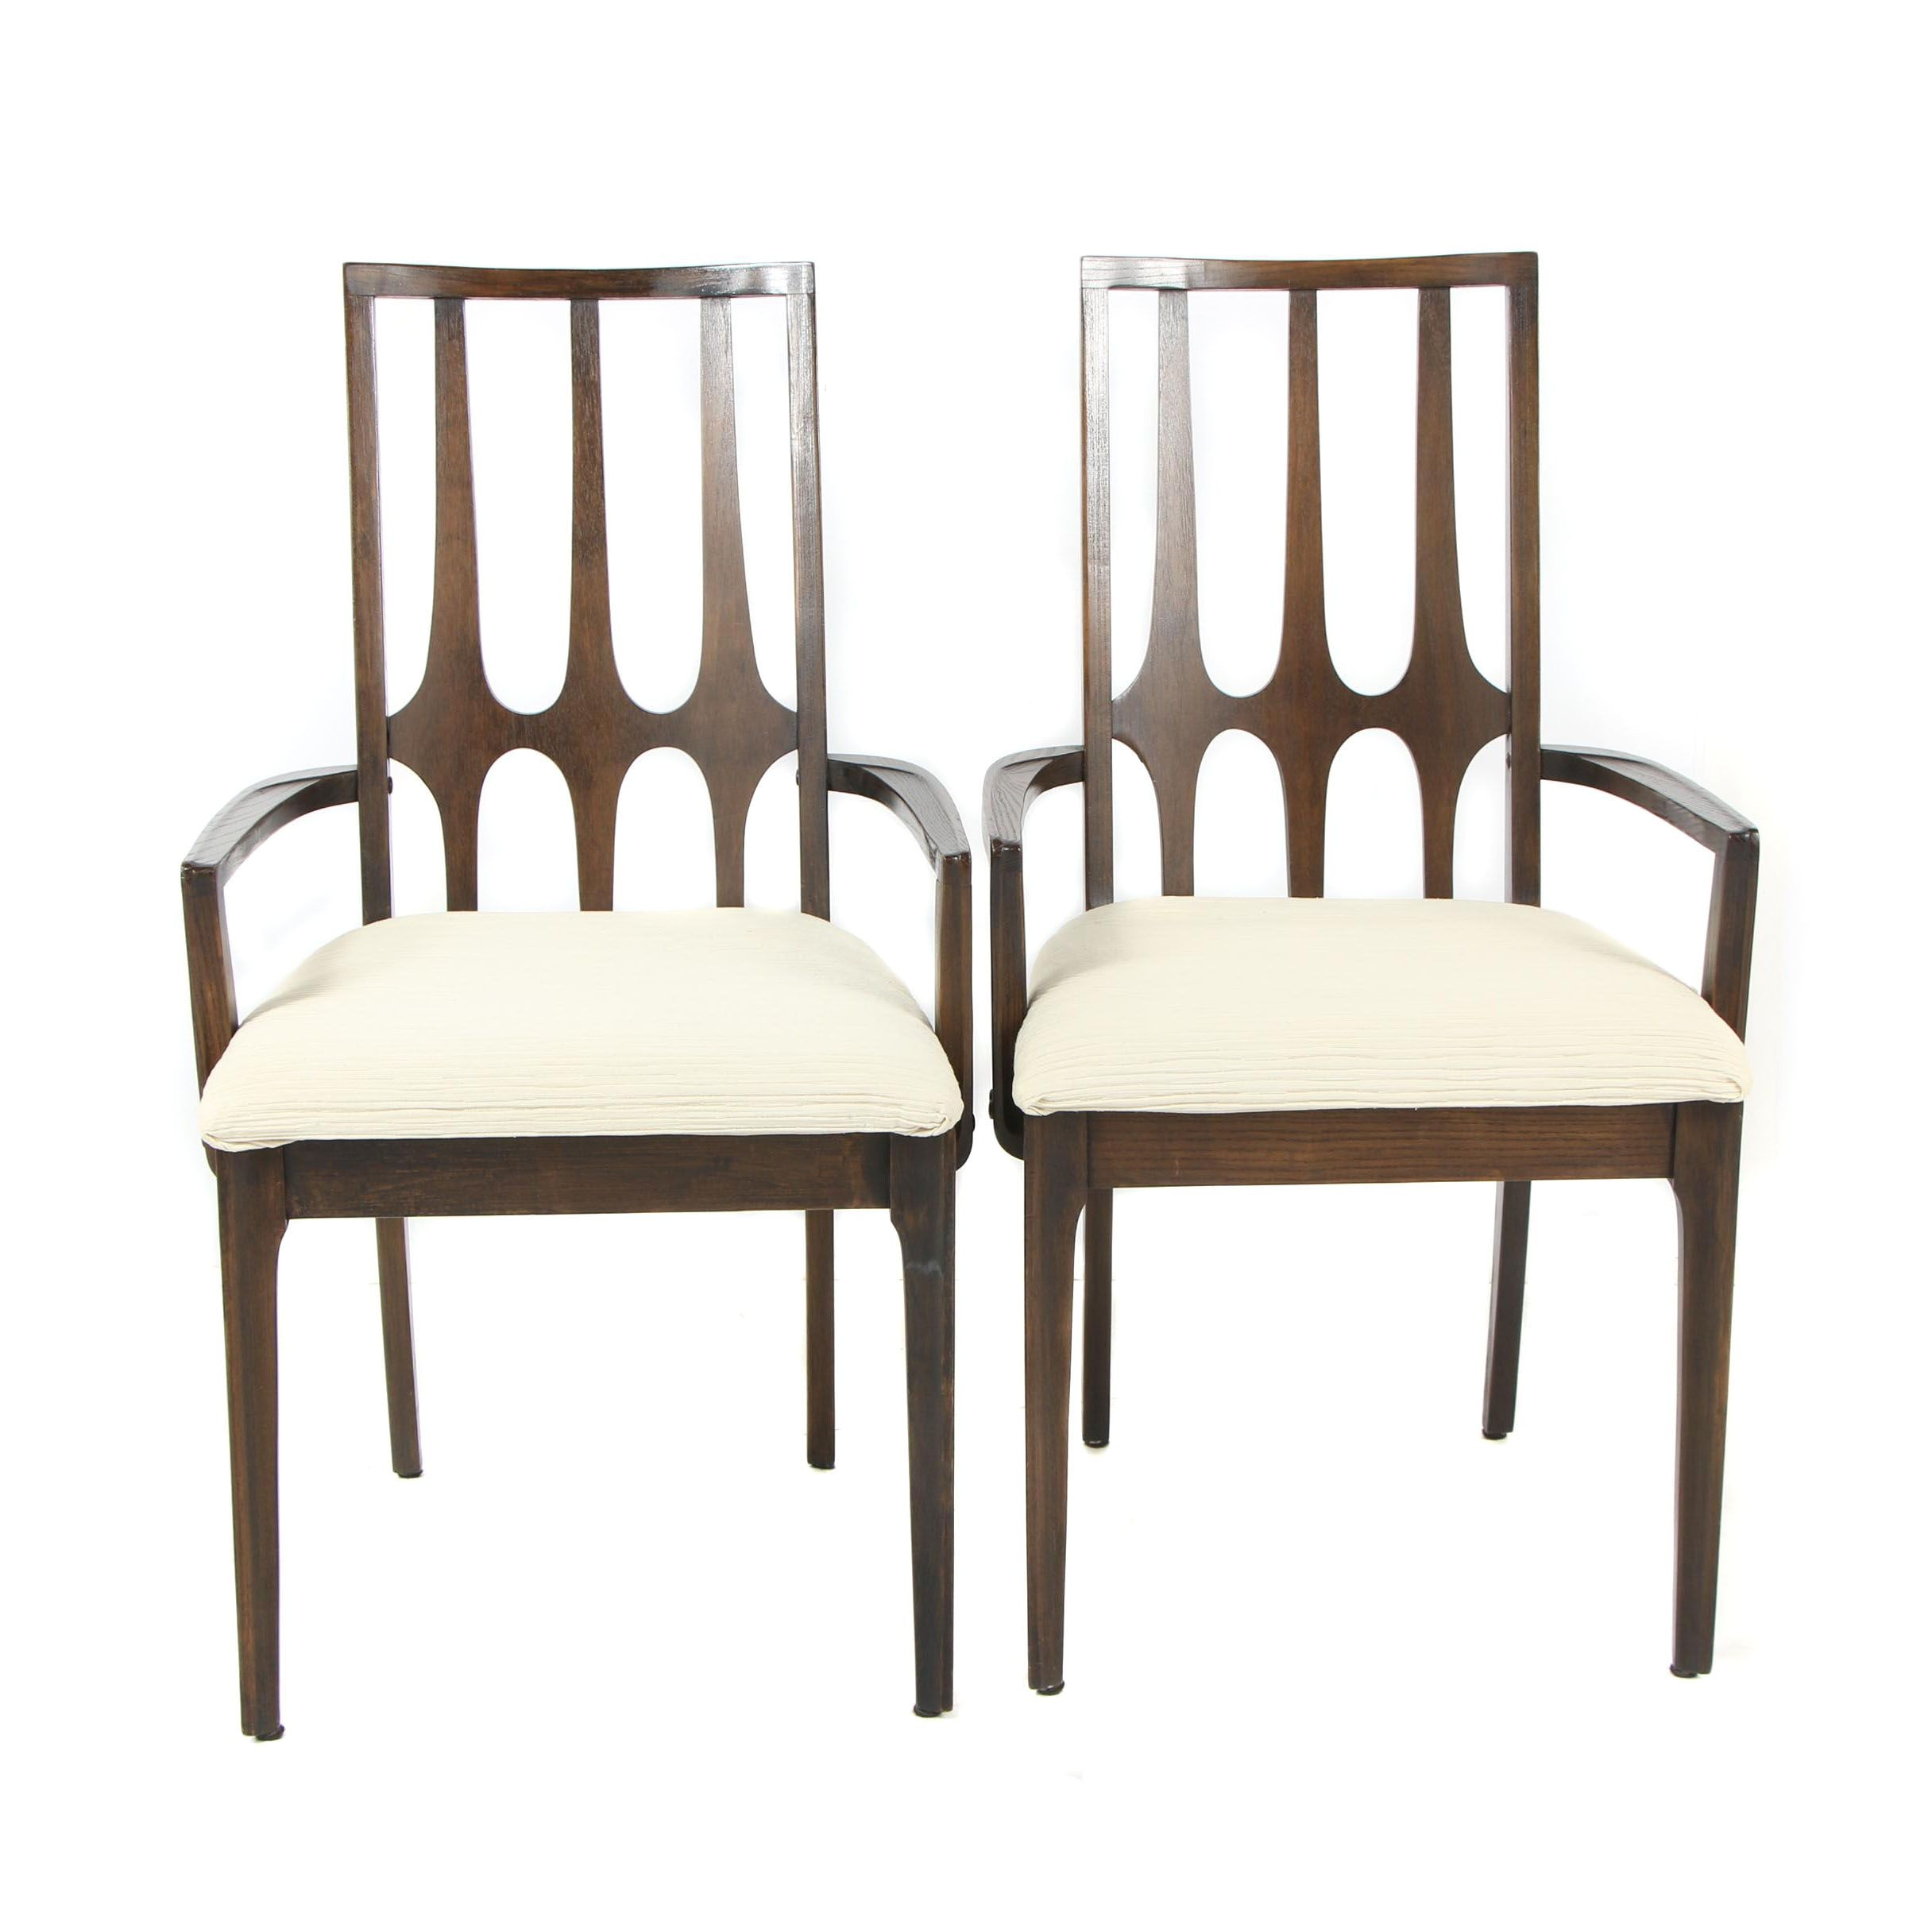 Pair of Mid-Century Modern Dining Armchairs